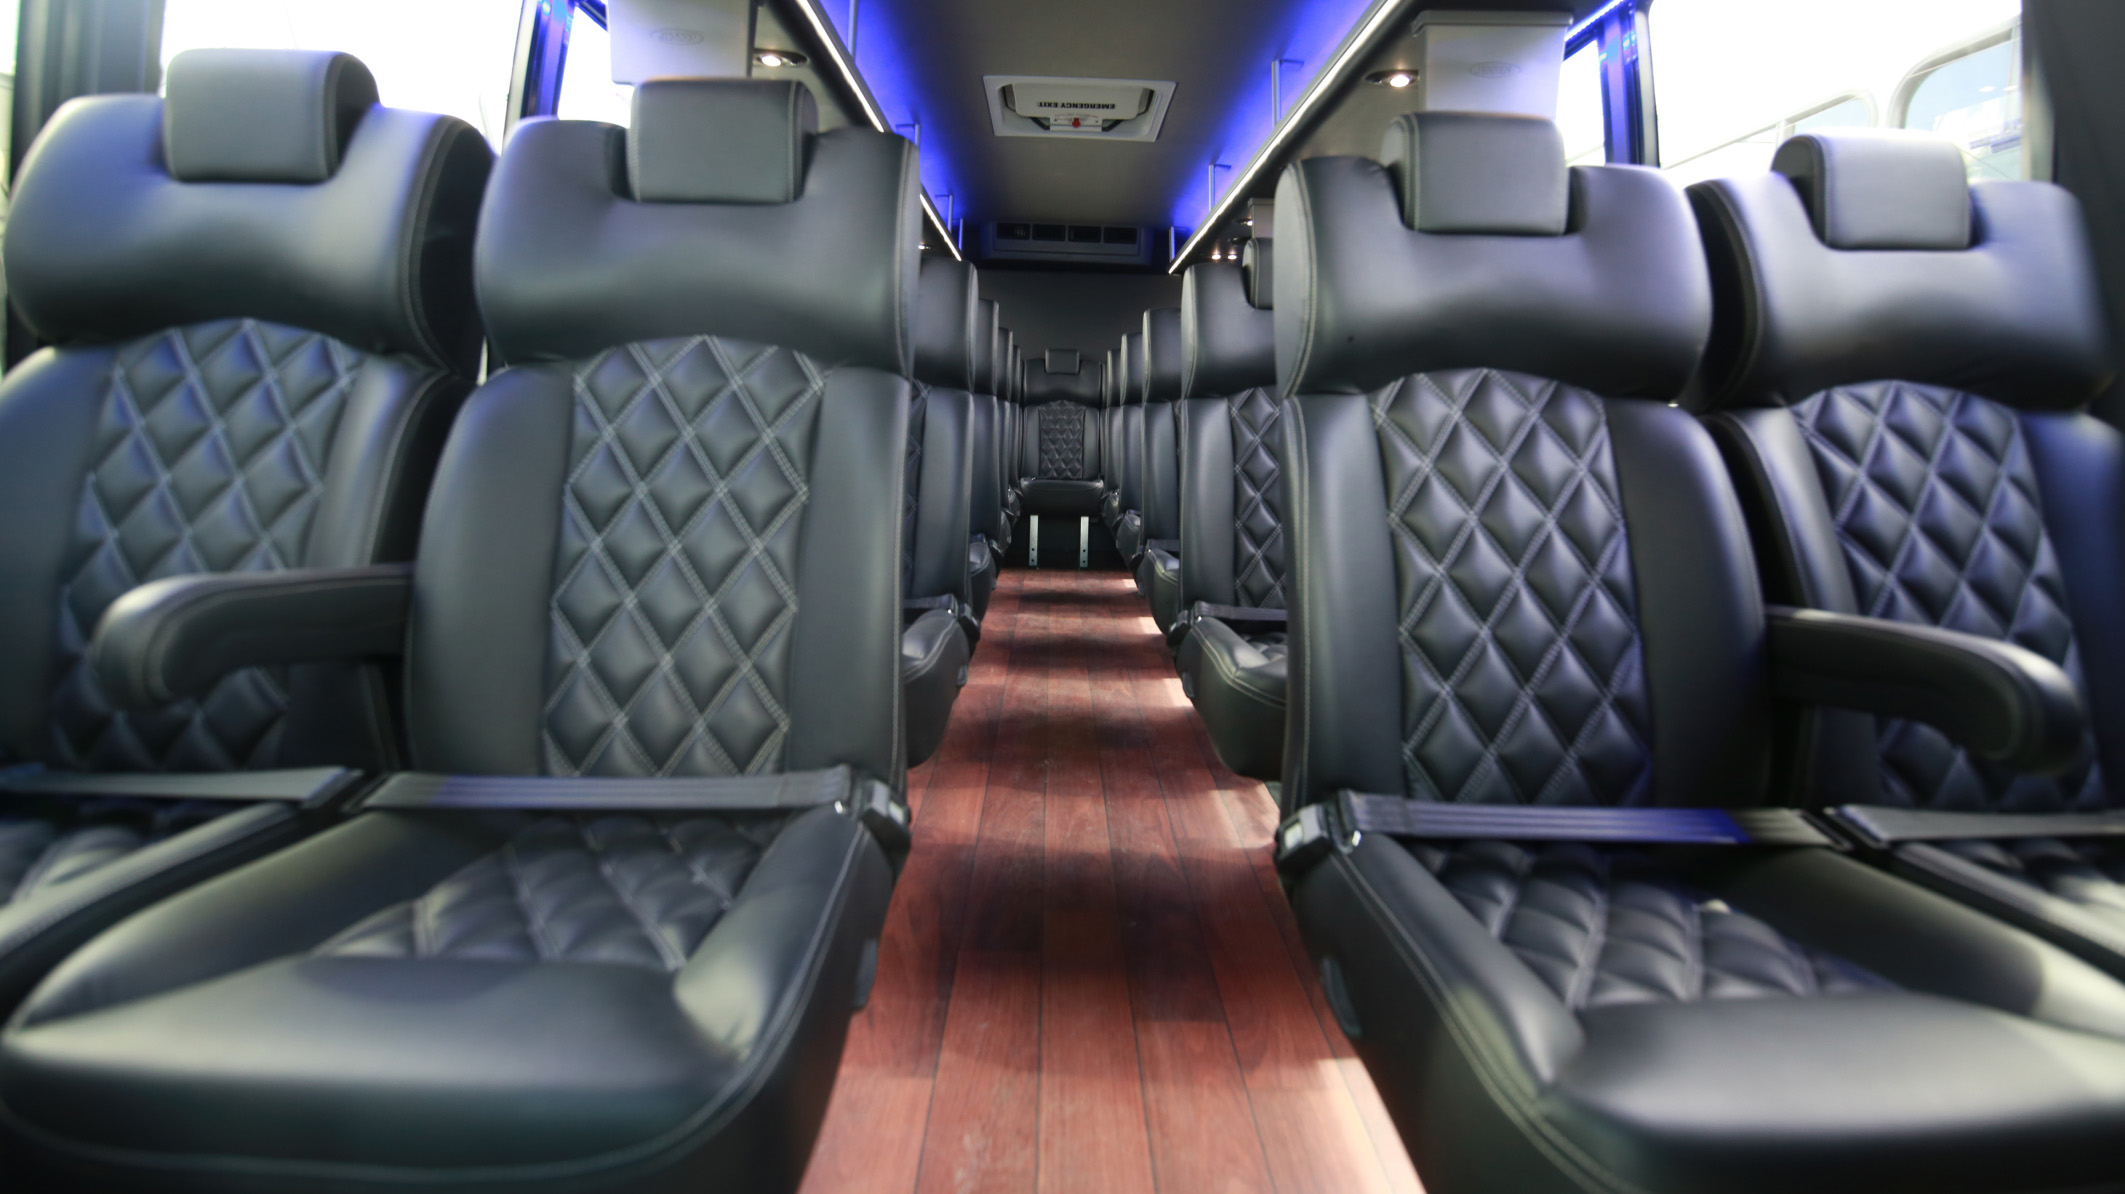 Interior-of-limo-bus-crop-ThinkstockPhotos-477101402-magedfarag